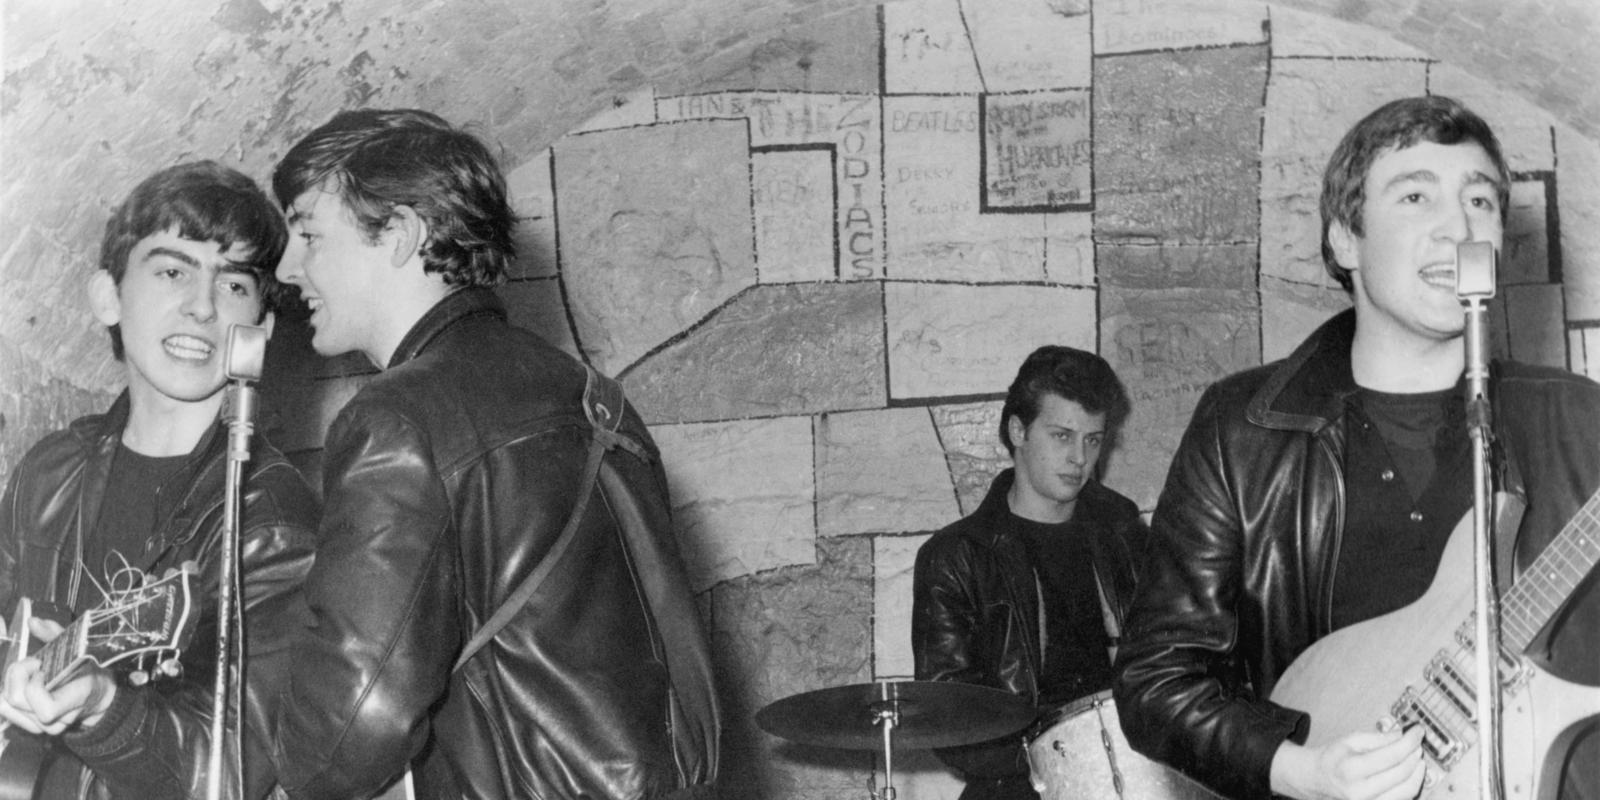 Beatles & Kansas City | The Pop History Dig